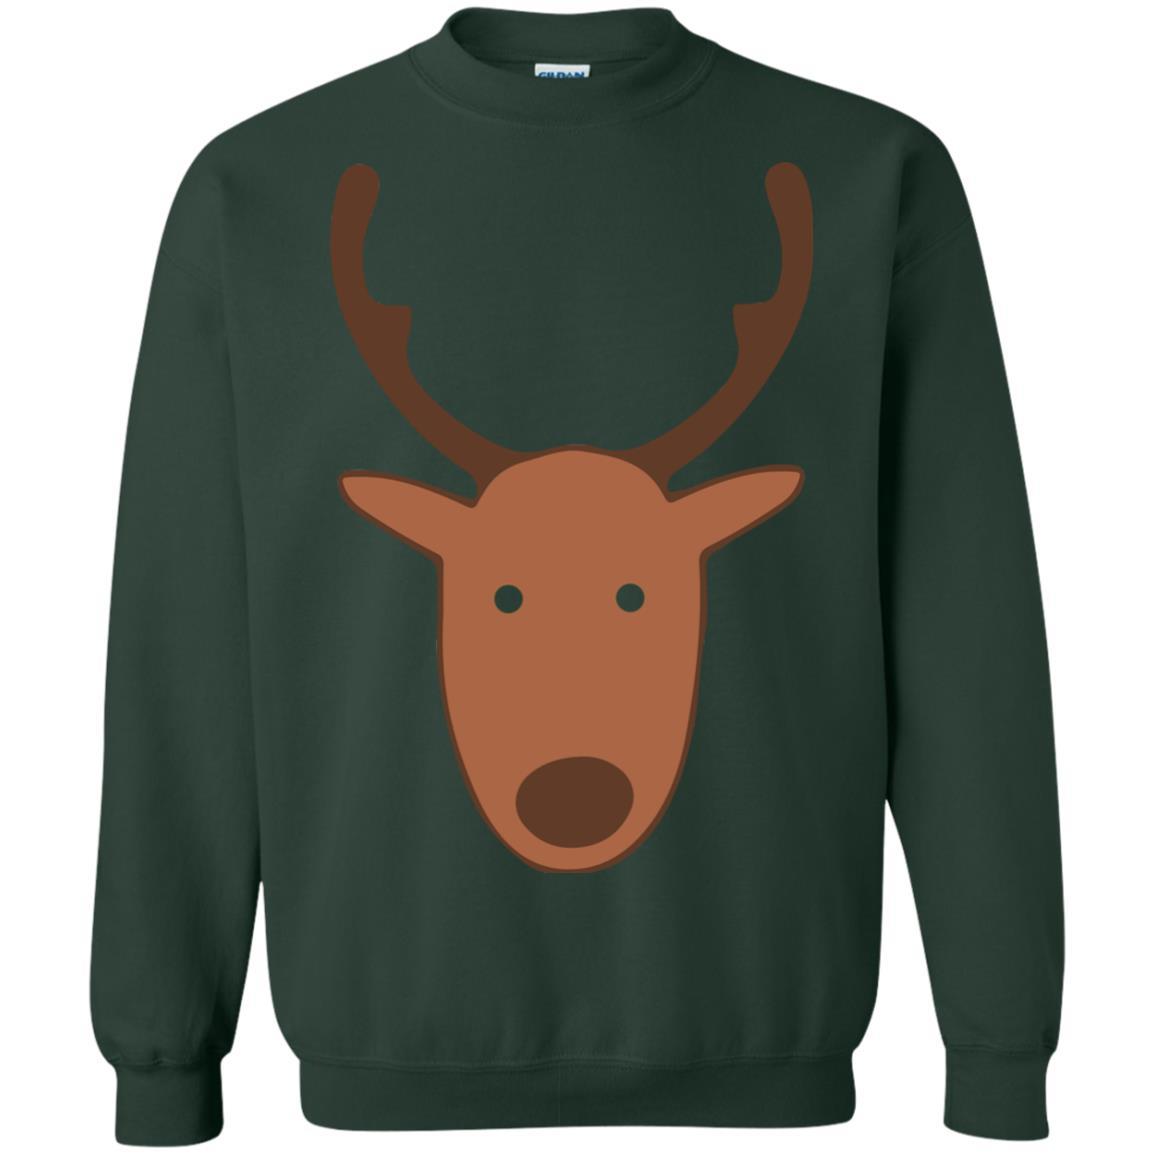 image 4776 - Tina Belcher Reindeer Christmas Sweater, Shirt, Hoodie